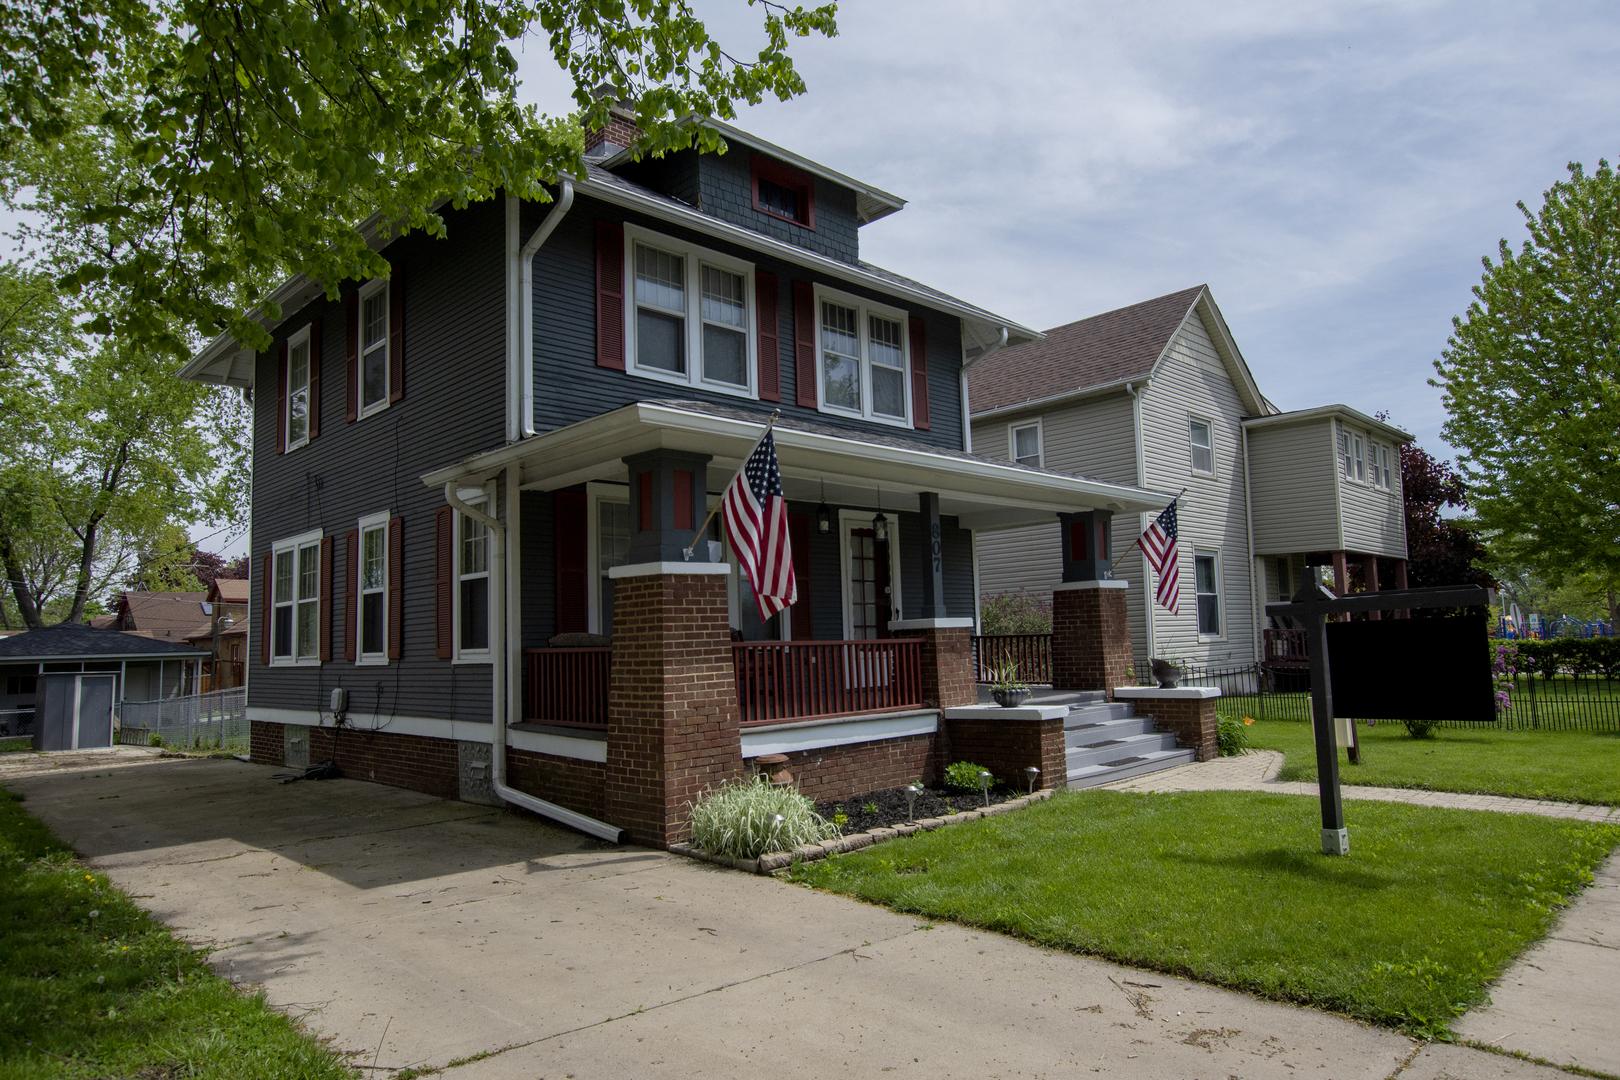 807 West New York, AURORA, Illinois, 60506